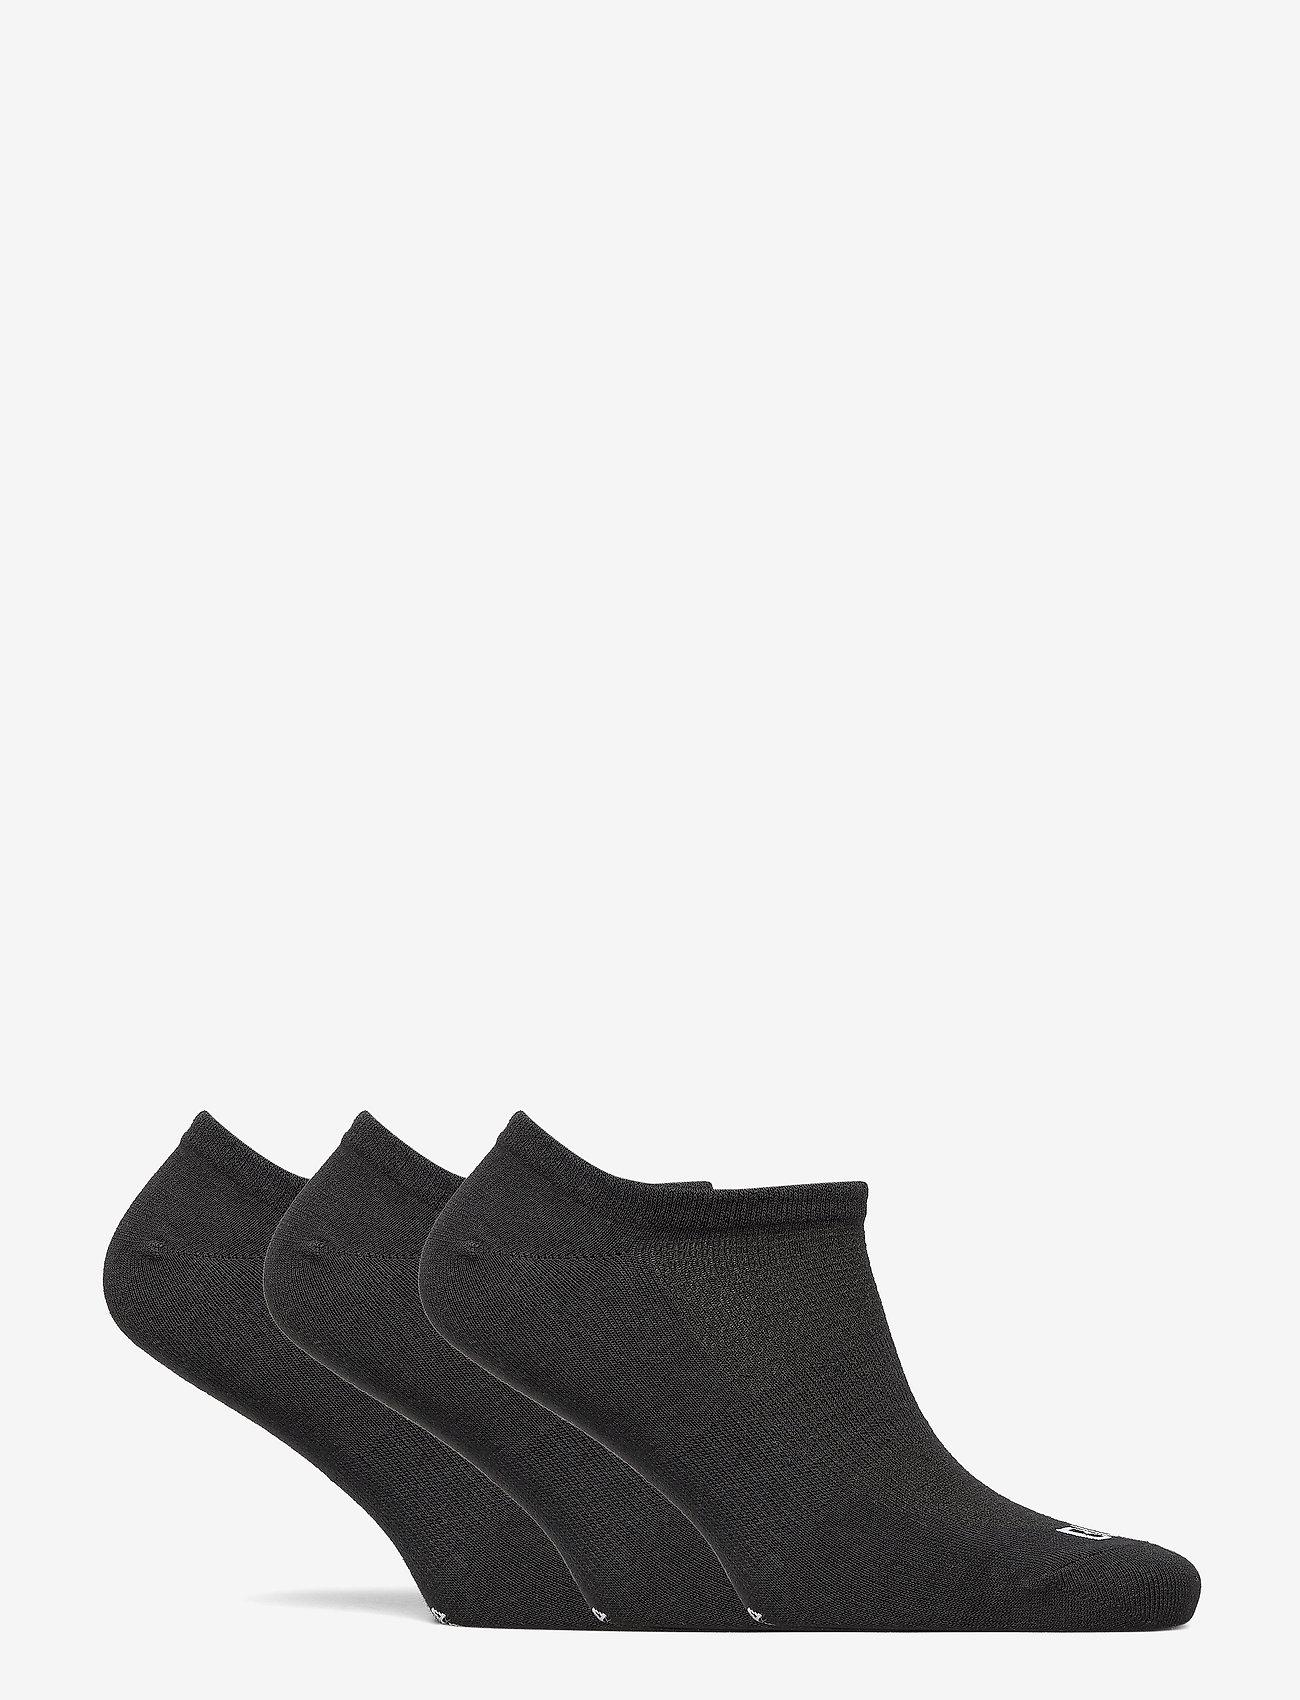 Bula 3PK NO SHOW SOCK - Sokker BLACK - Menn Klær